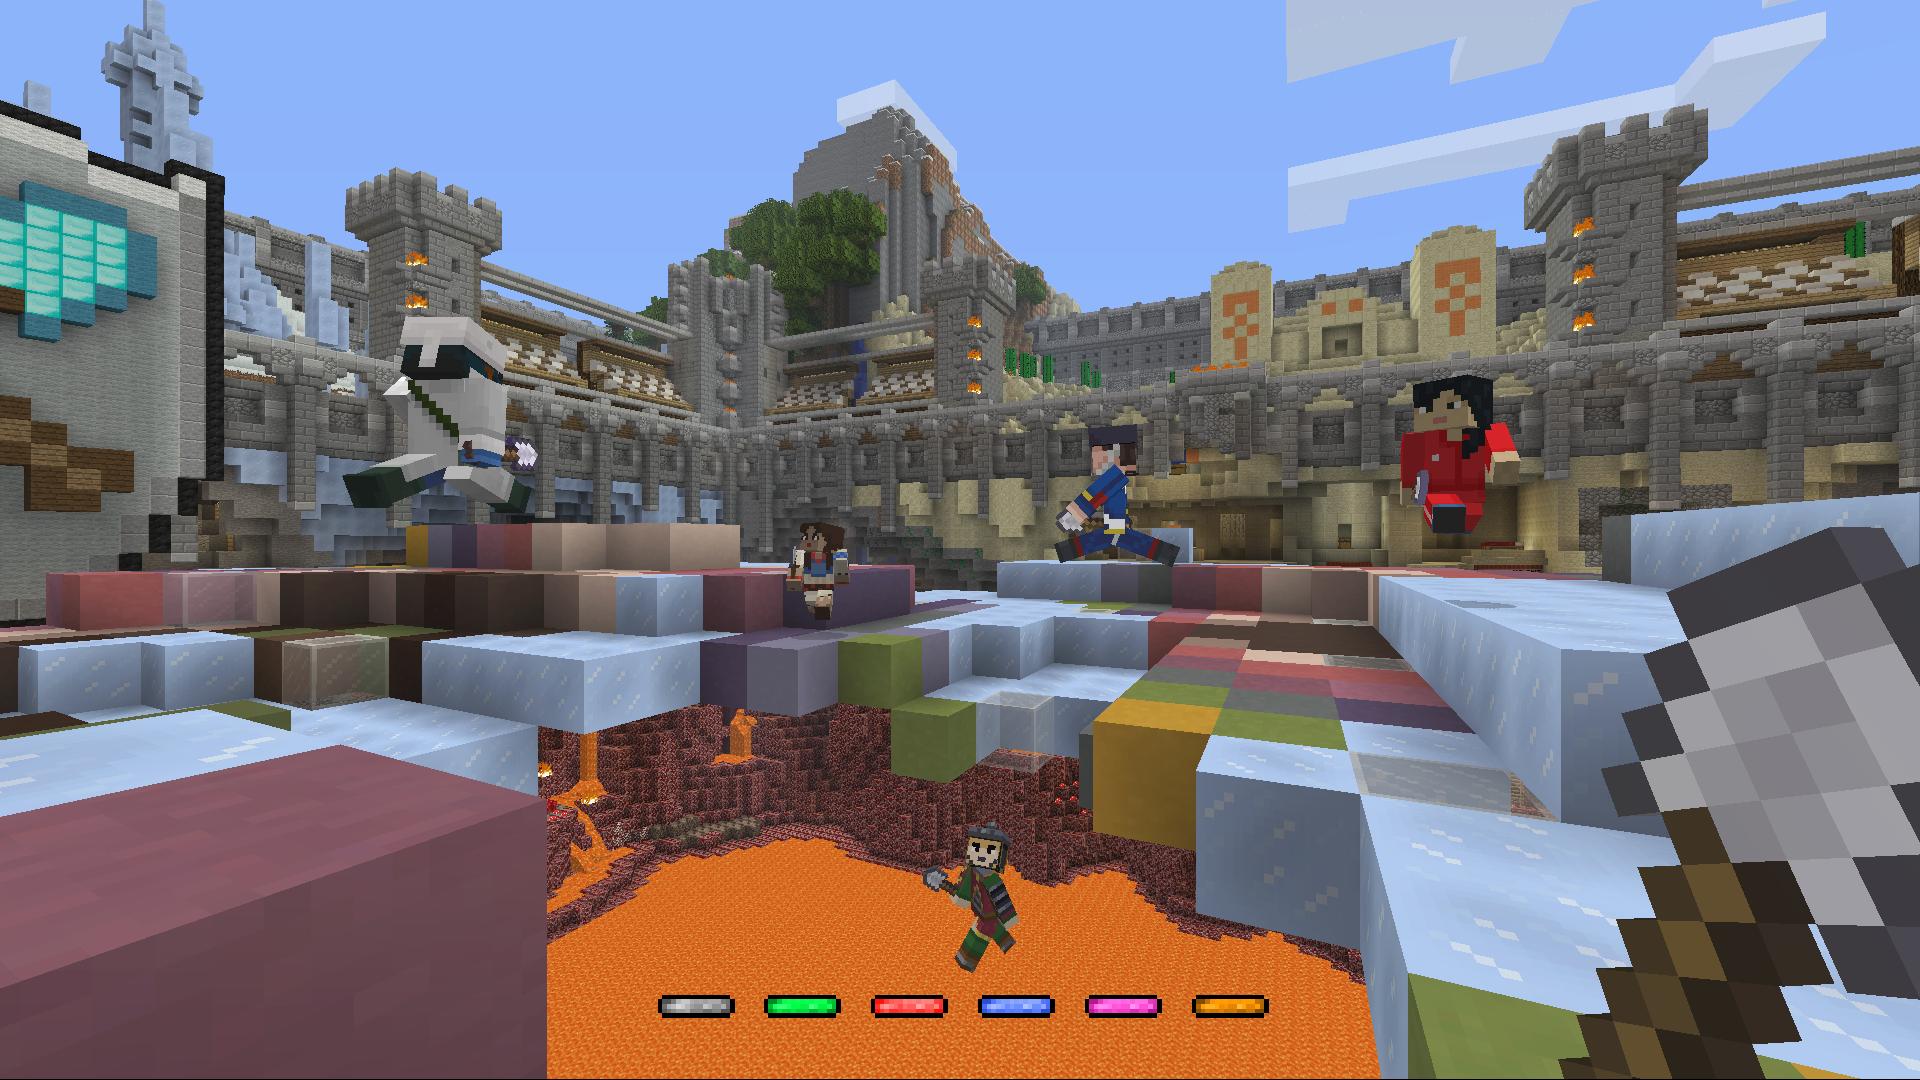 Minecraft Tumble